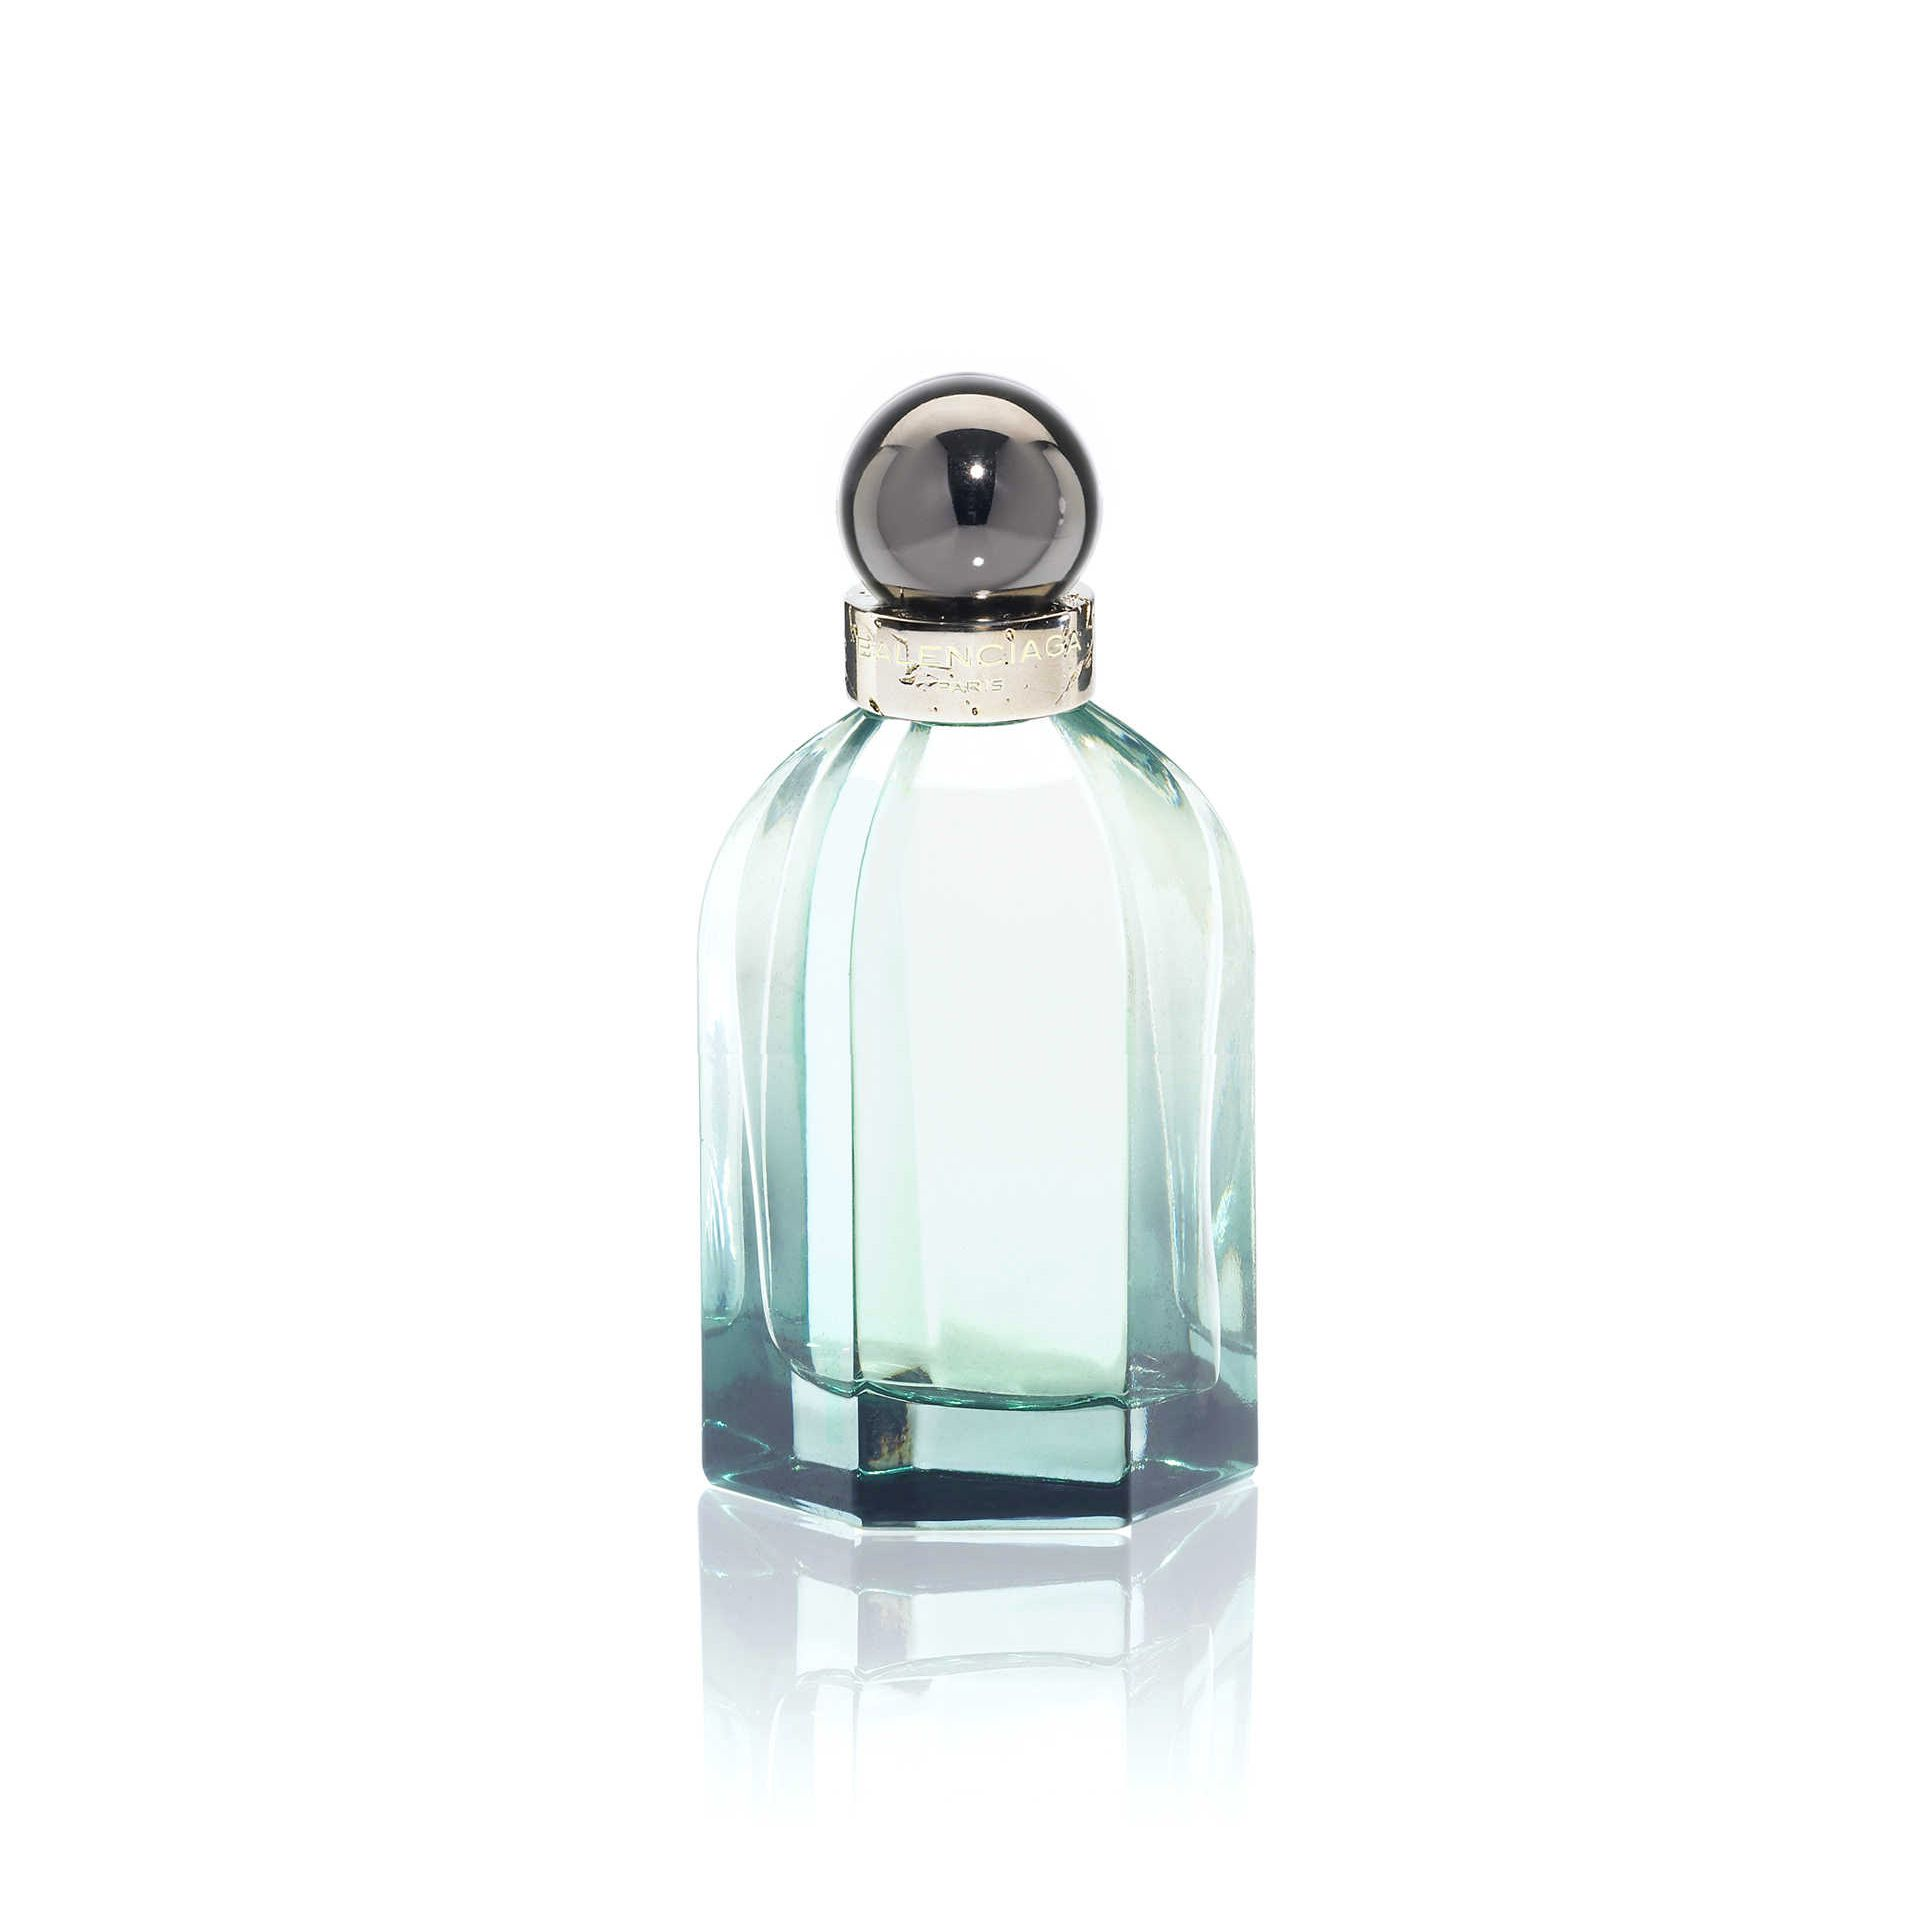 BALENCIAGA Balenciaga L'Essence Eau De Parfum 75Ml Perfume D f